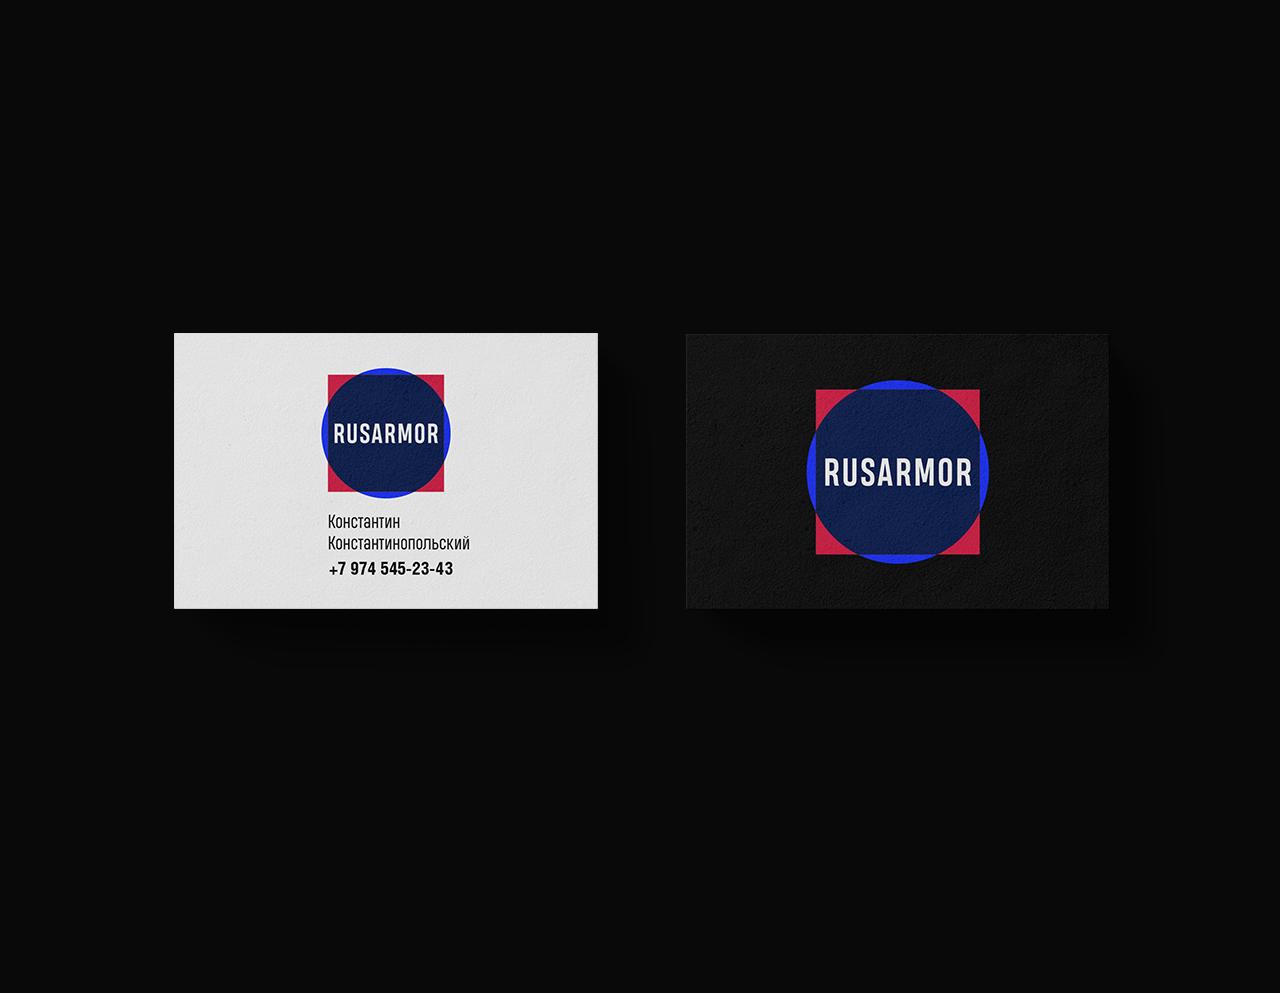 Разработка логотипа технологического стартапа РУСАРМОР фото f_1765a0df8209d6fb.jpg